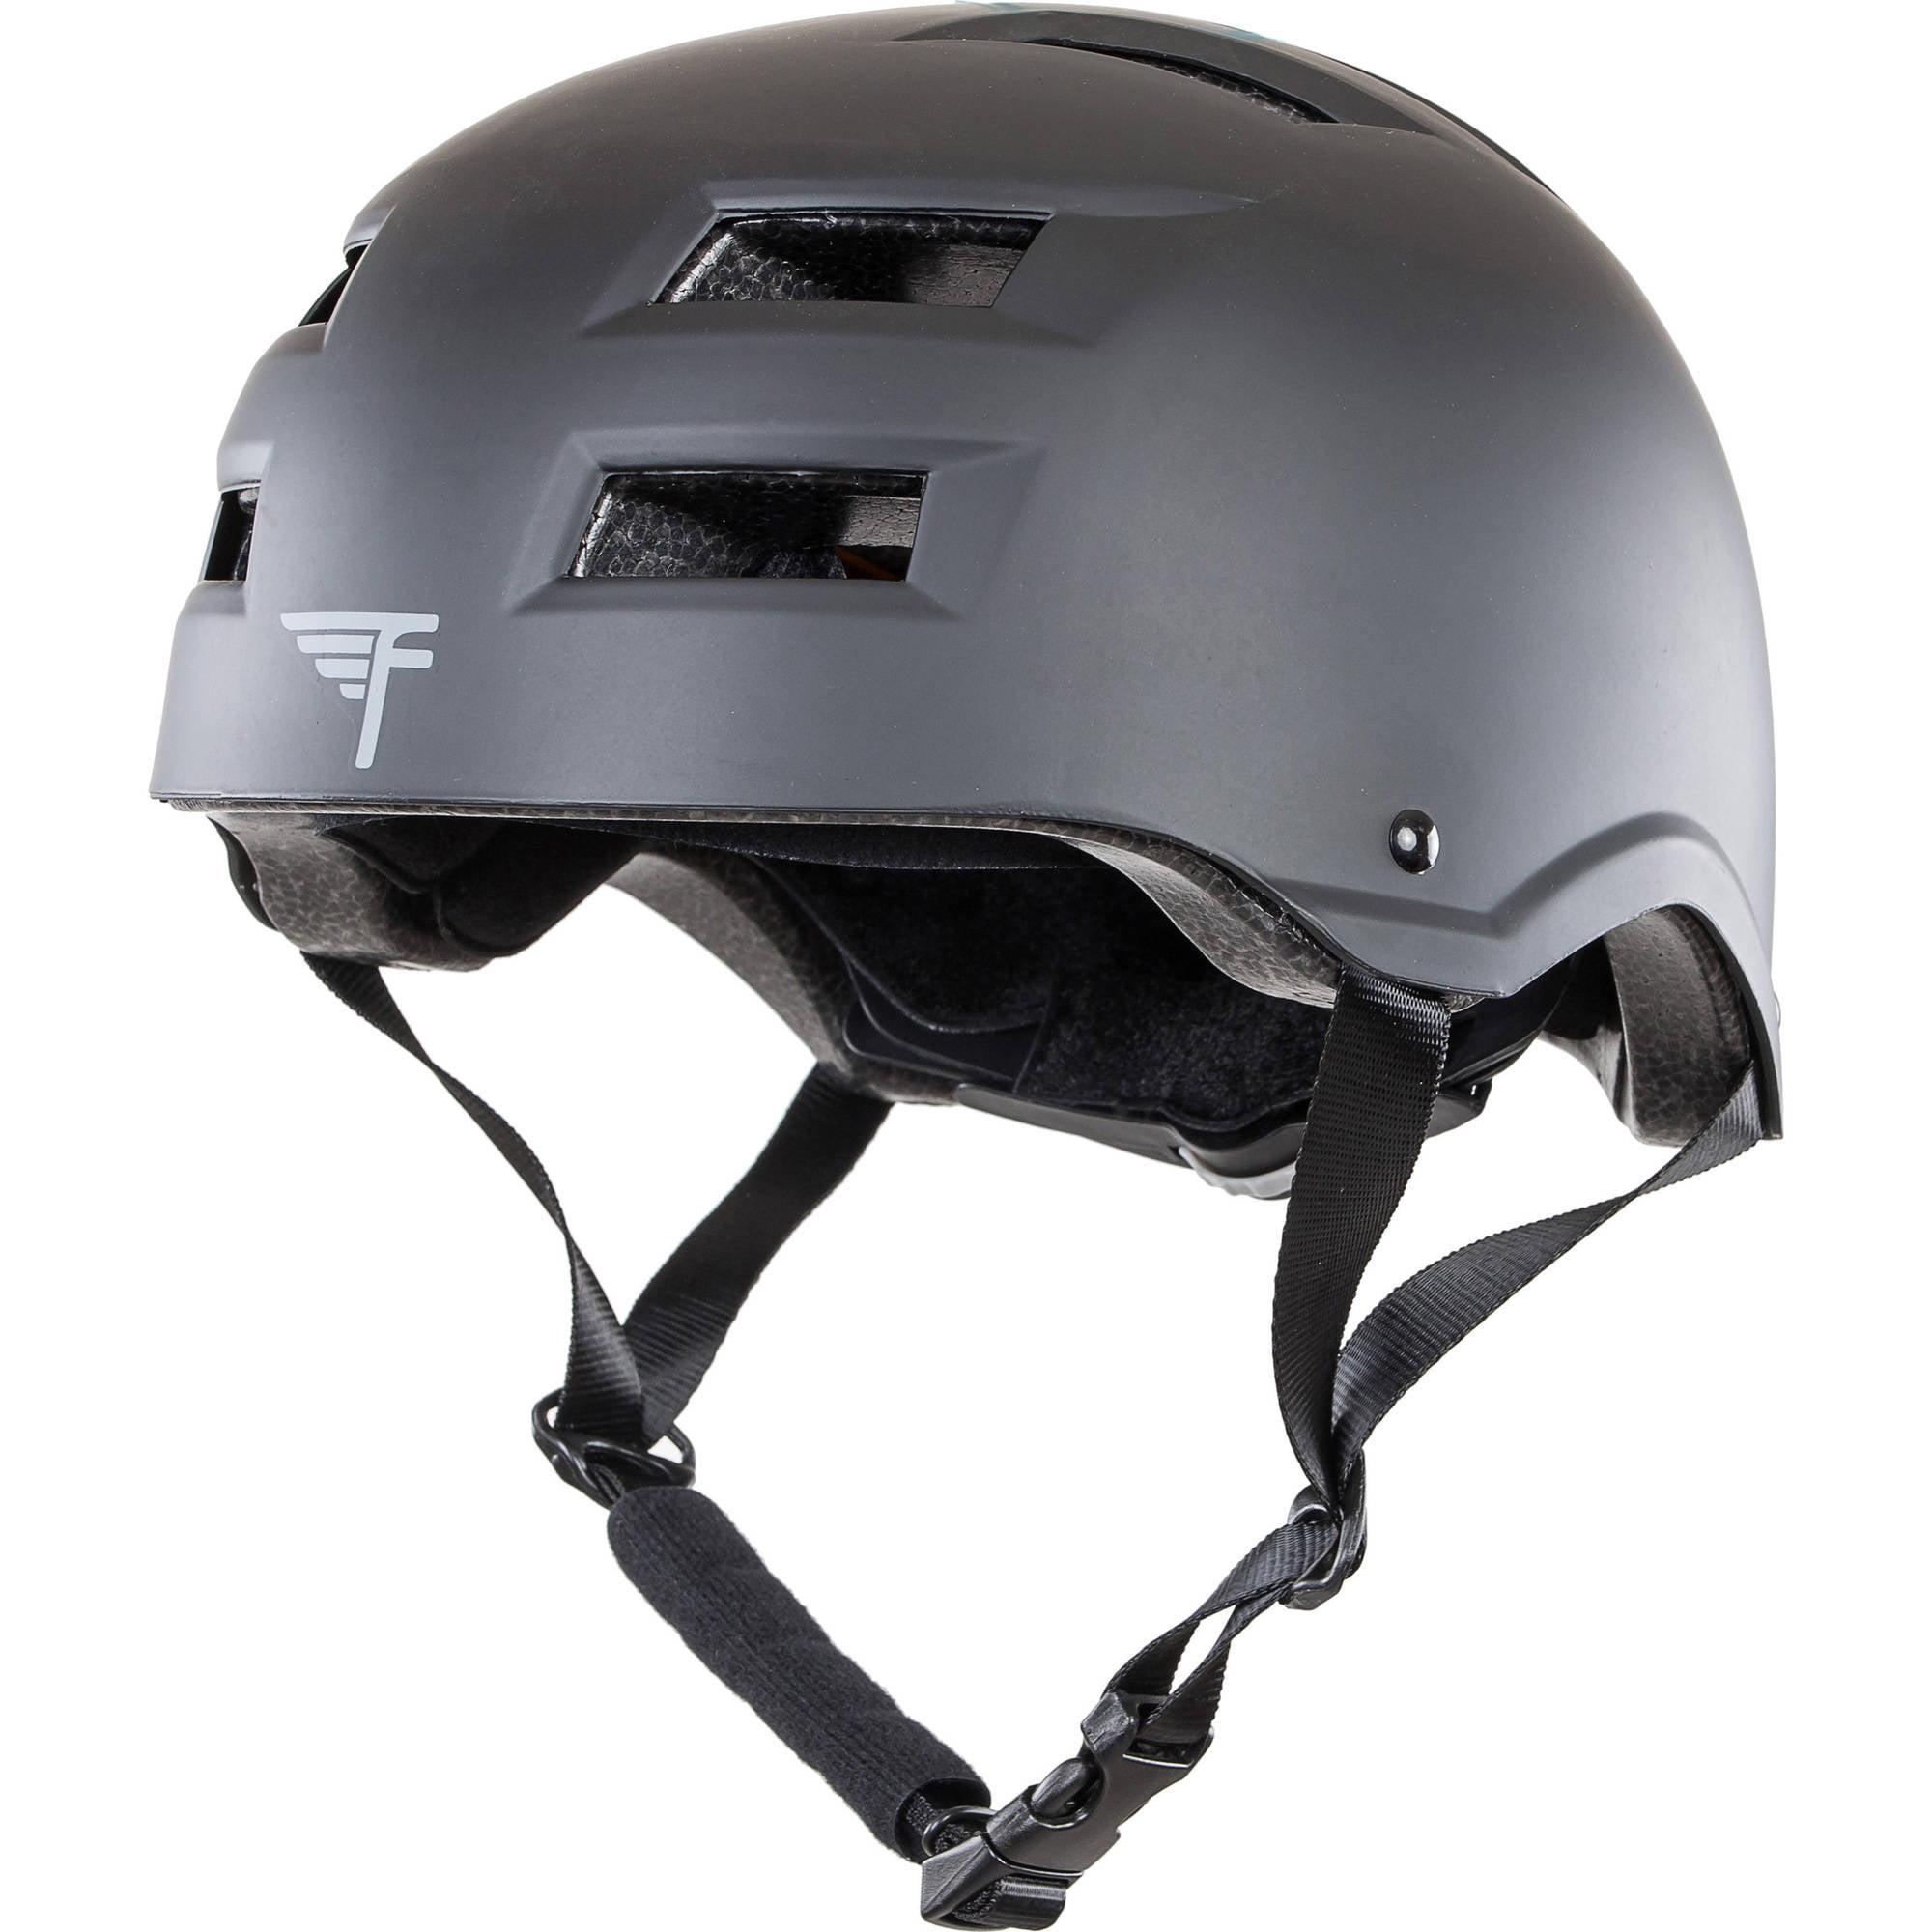 Flybar Multi Sport Helmet, Black, M L by Flybar